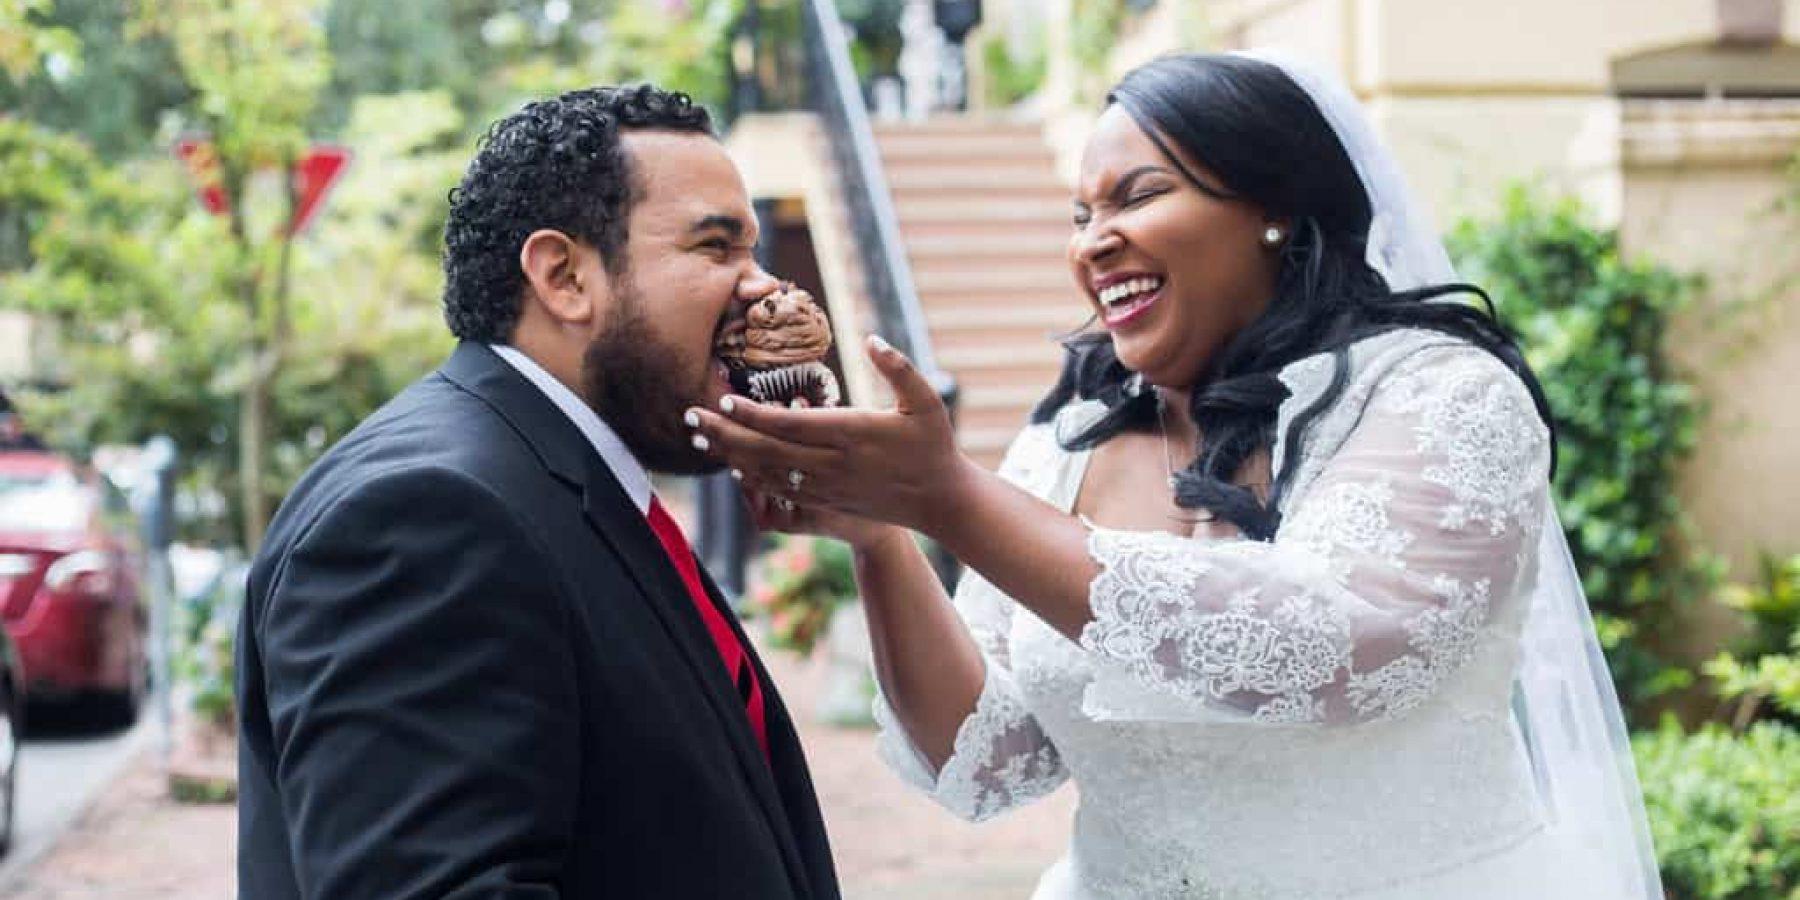 Wedding Photo Fun with Cupcakes!